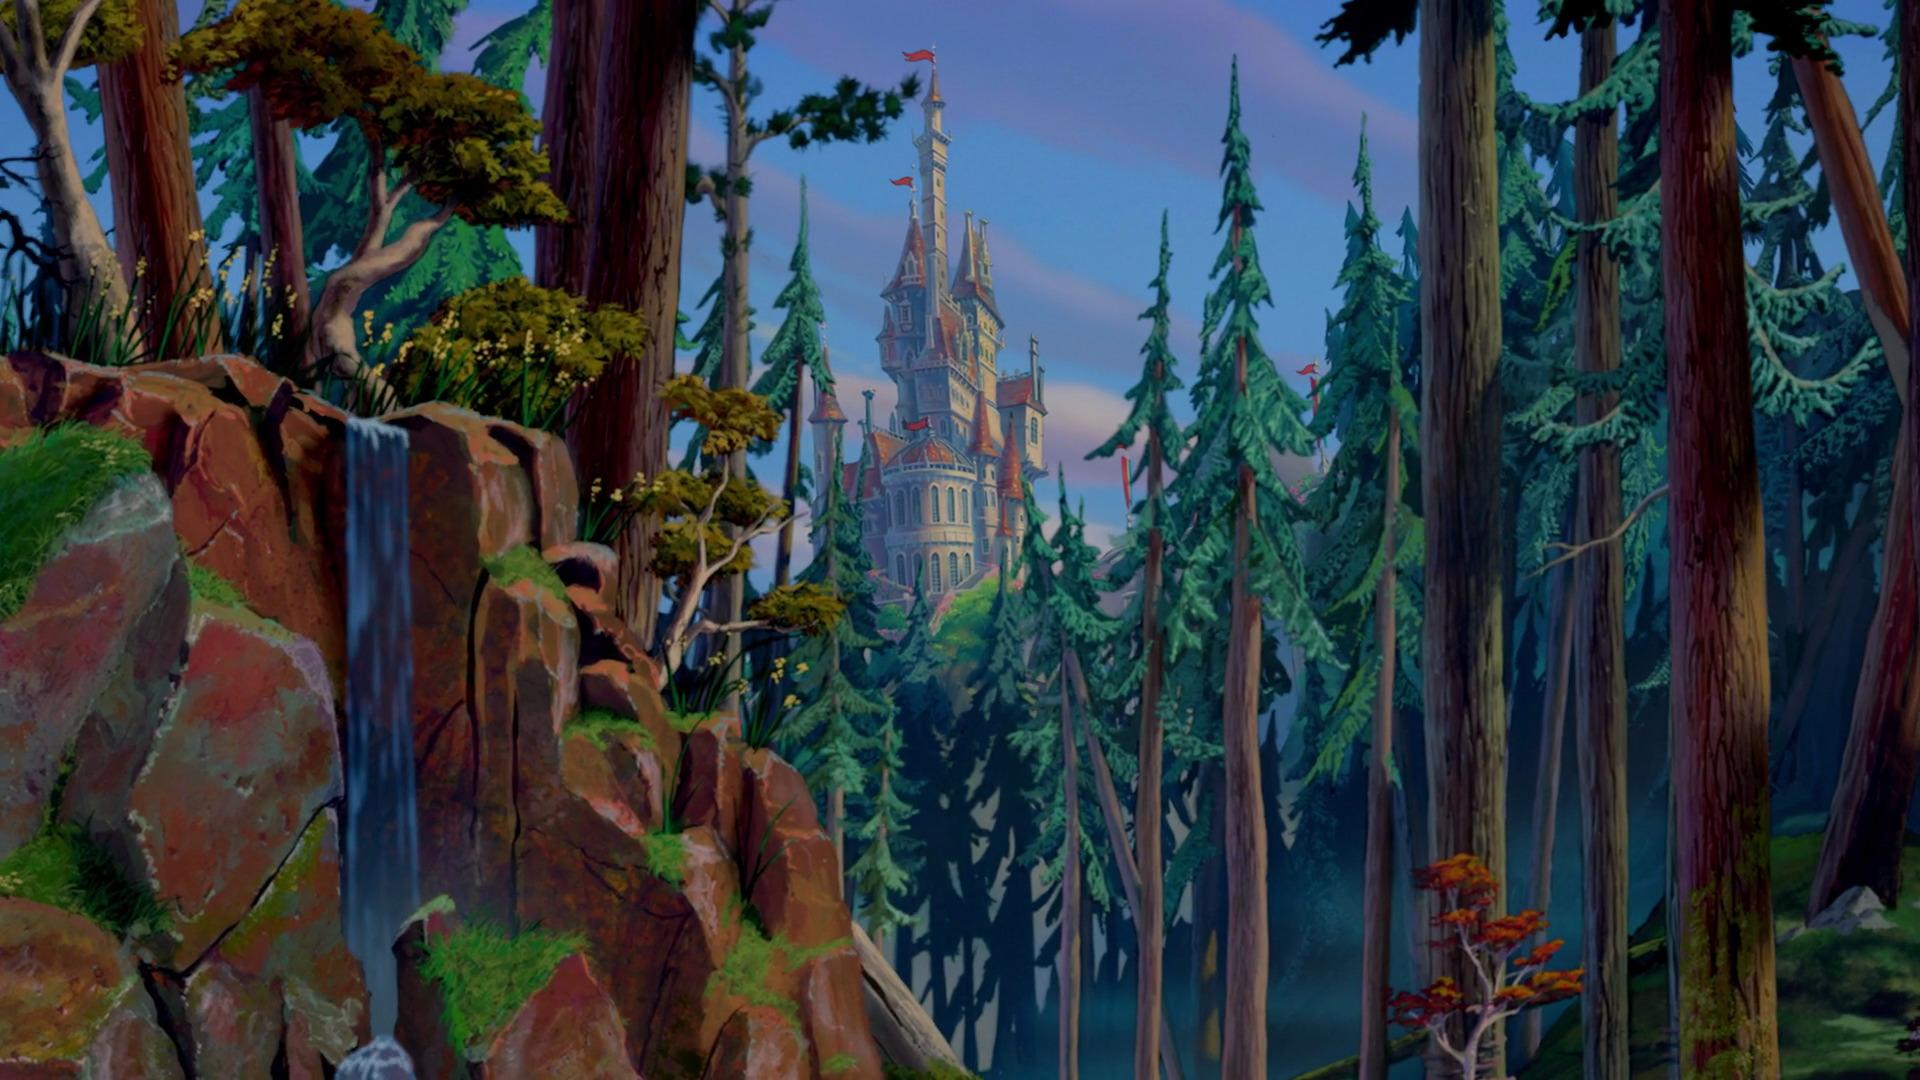 beast's castle | disney wiki | fandom poweredwikia